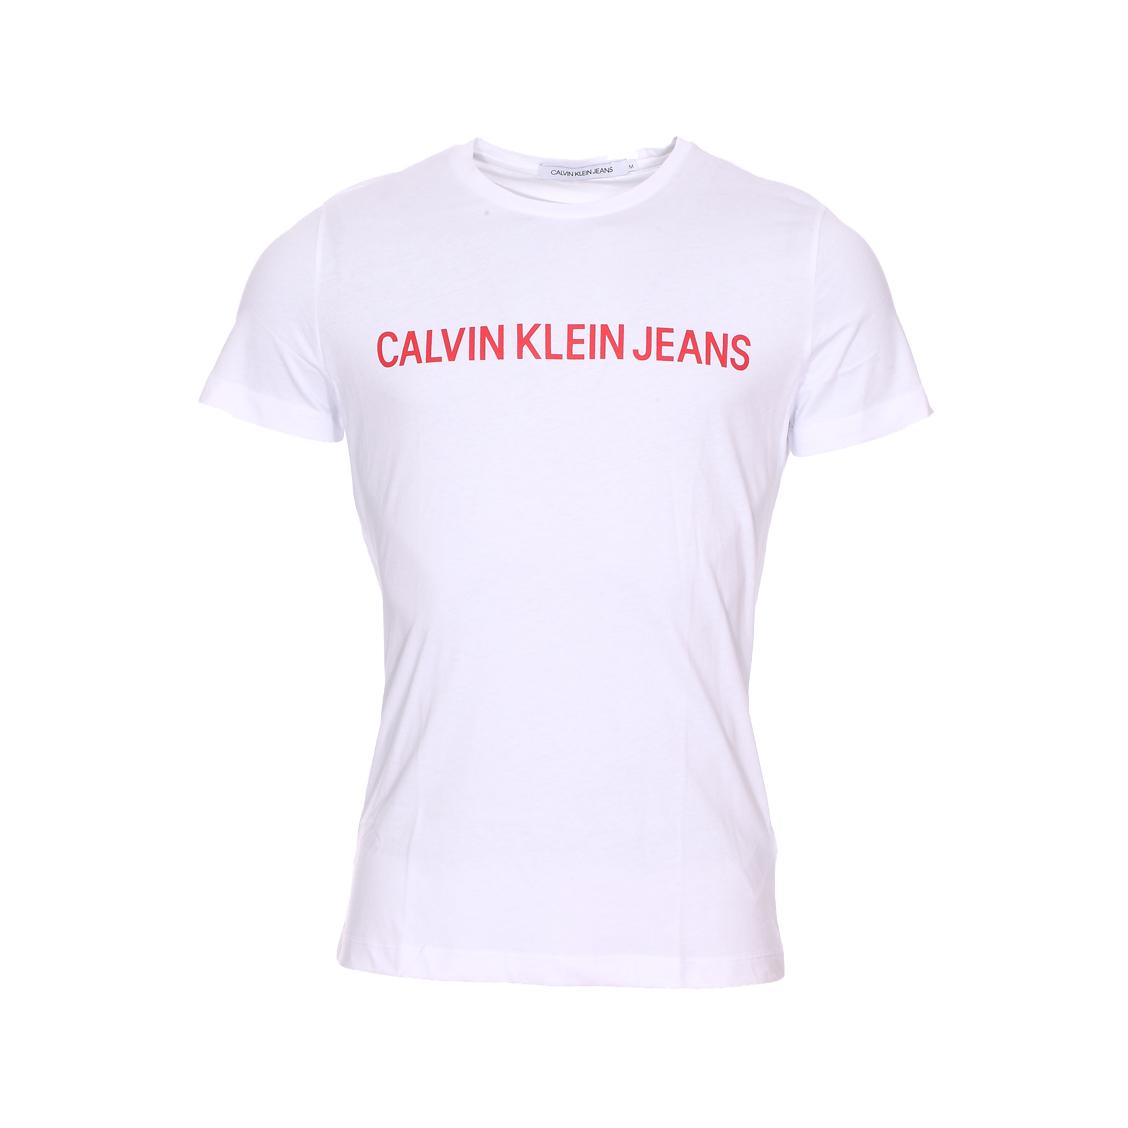 Tee-shirt col rond  institutional logo slim en coton blanc floqué